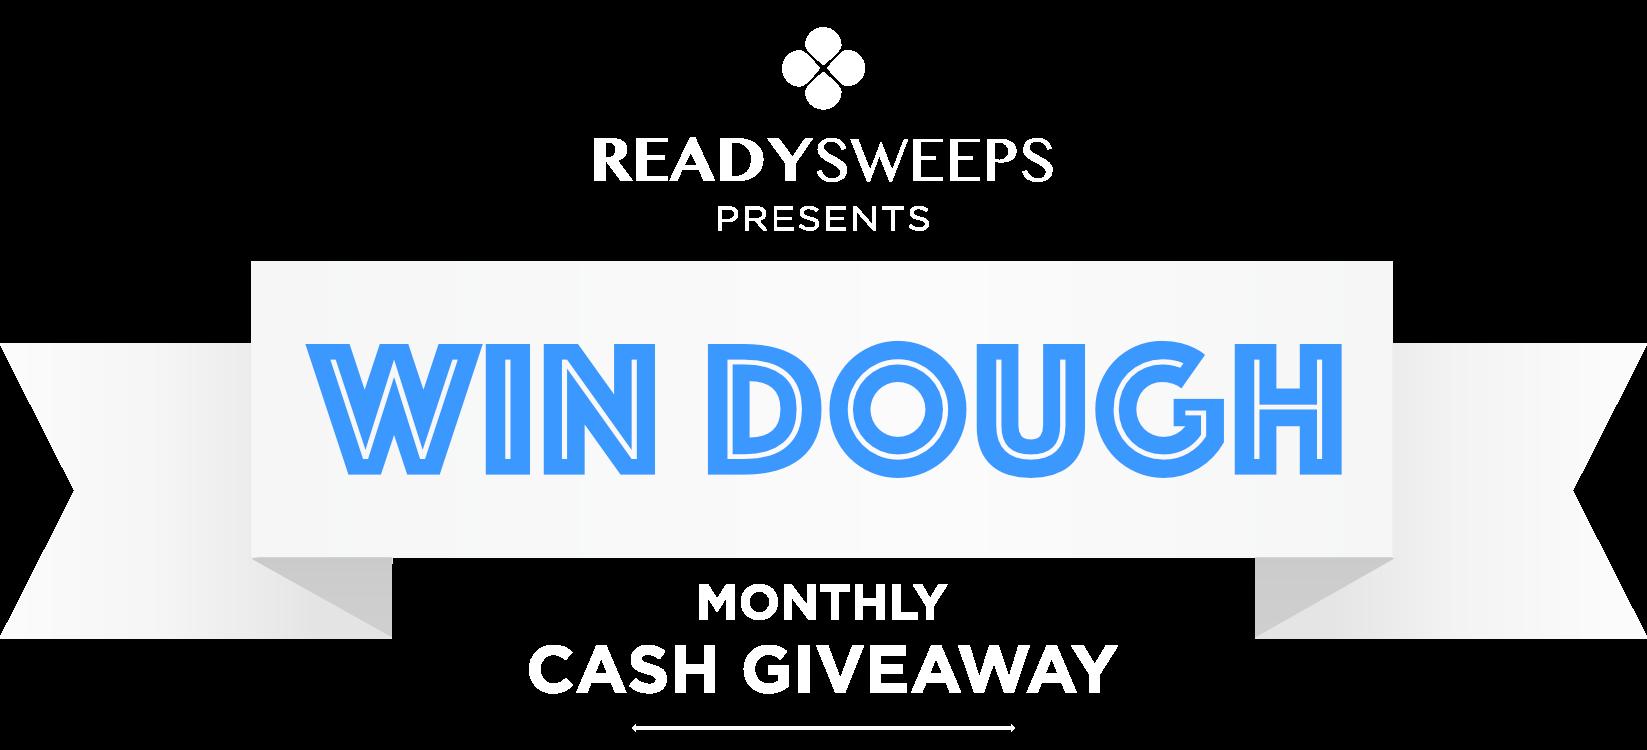 WIN DOUGH by READYsweeps